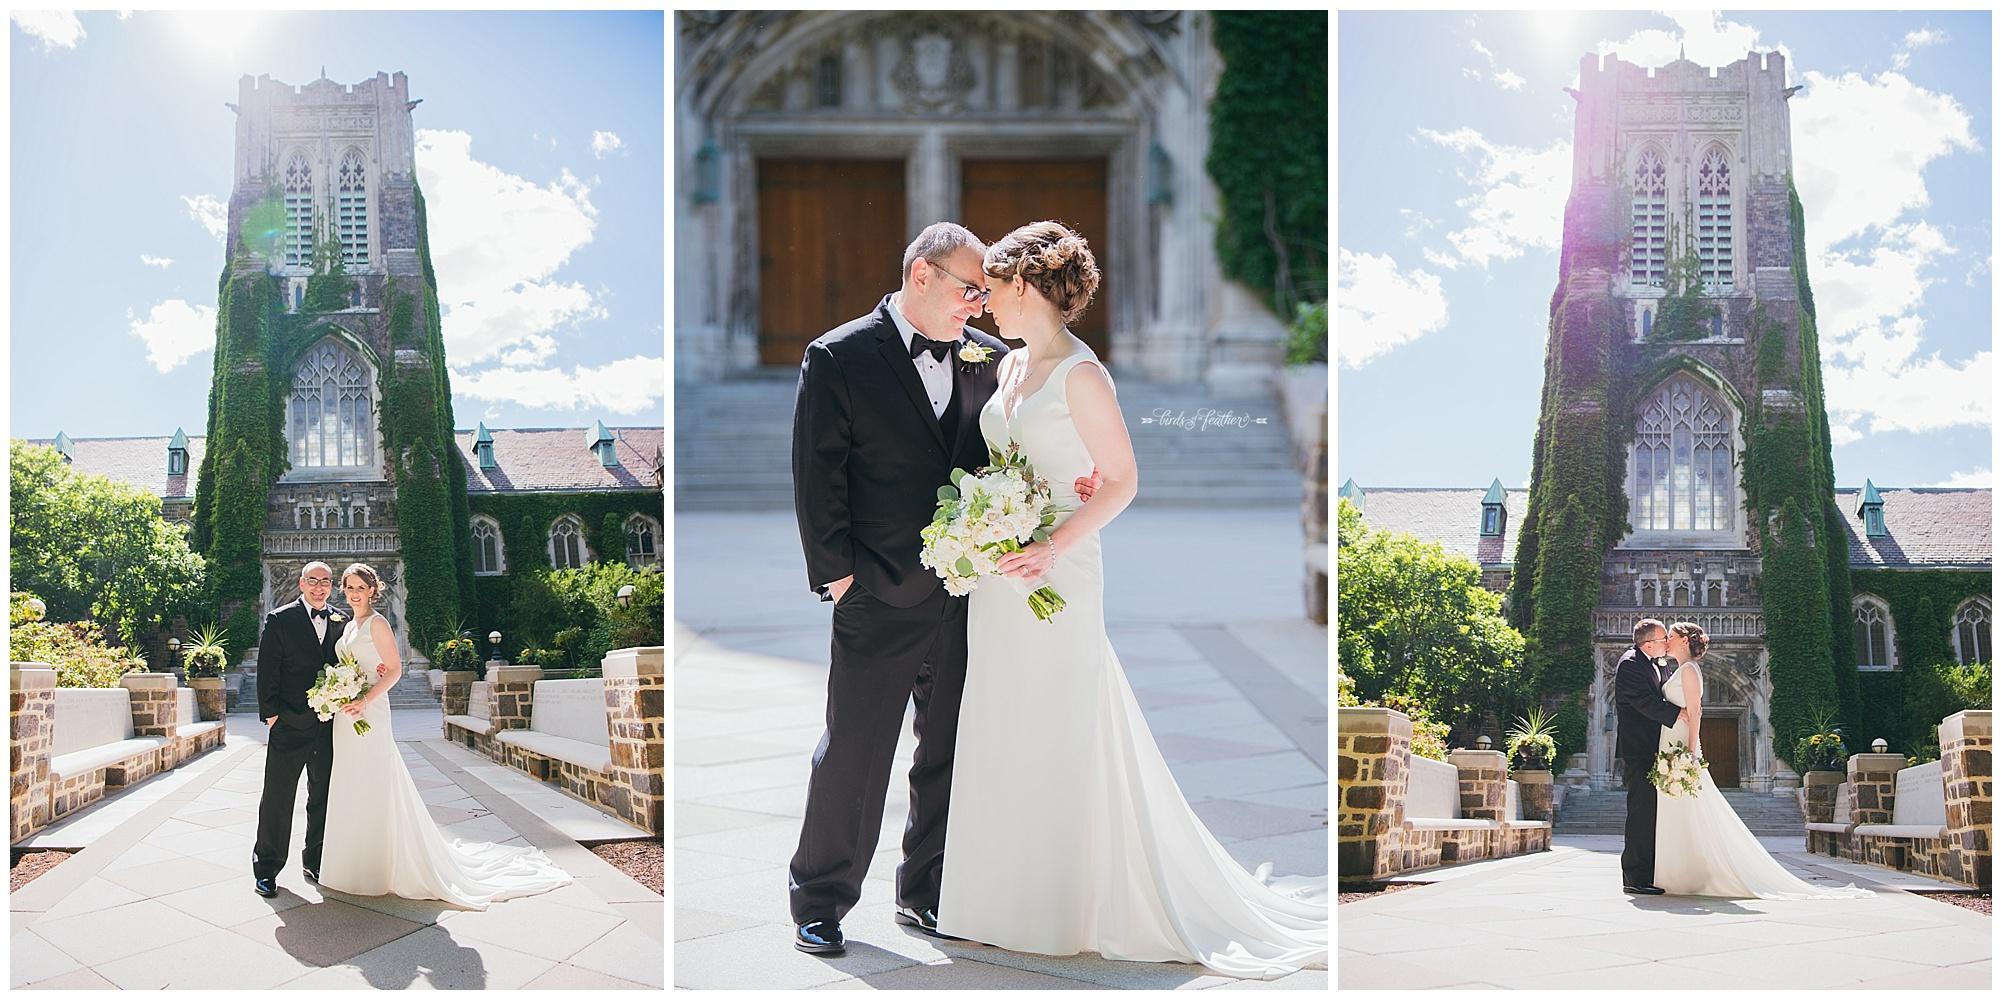 Cassie & Michael | Lehigh University Wedding, Bethlehem PA | Birds of a Feather Photography